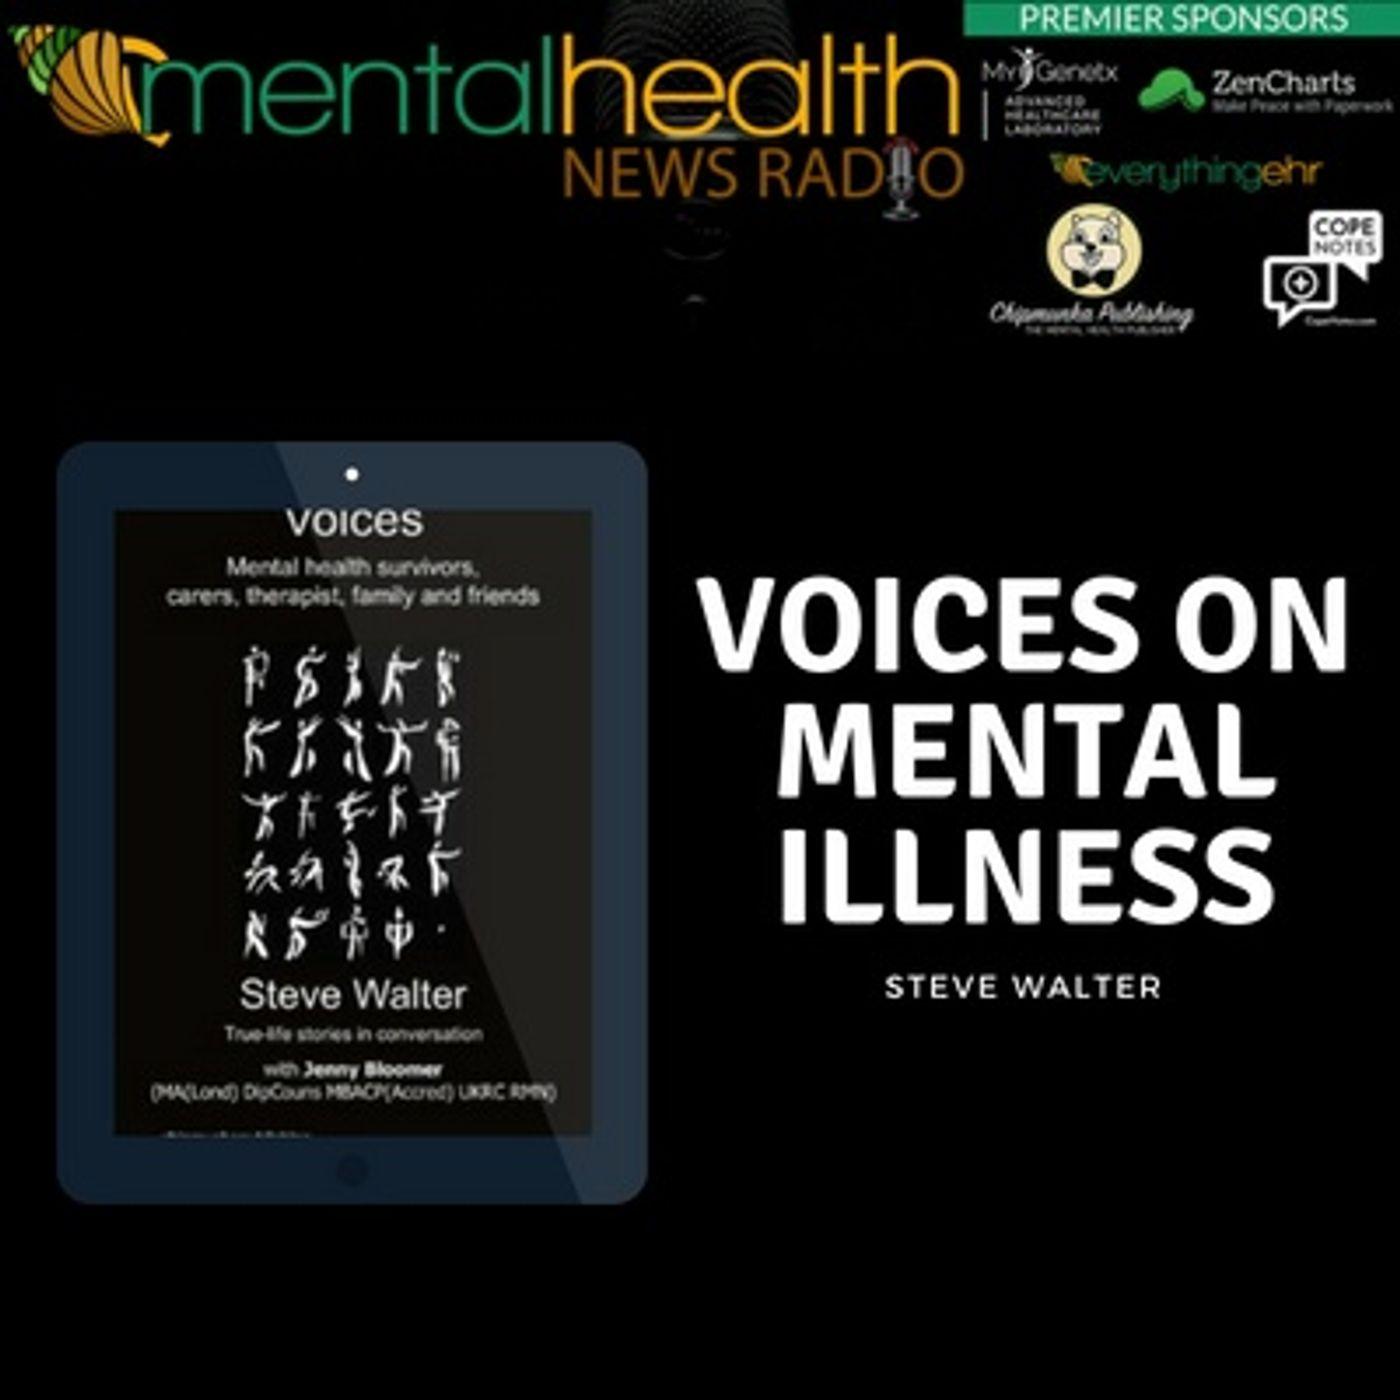 Mental Health News Radio - Voices on Mental Illness with Steve Walter